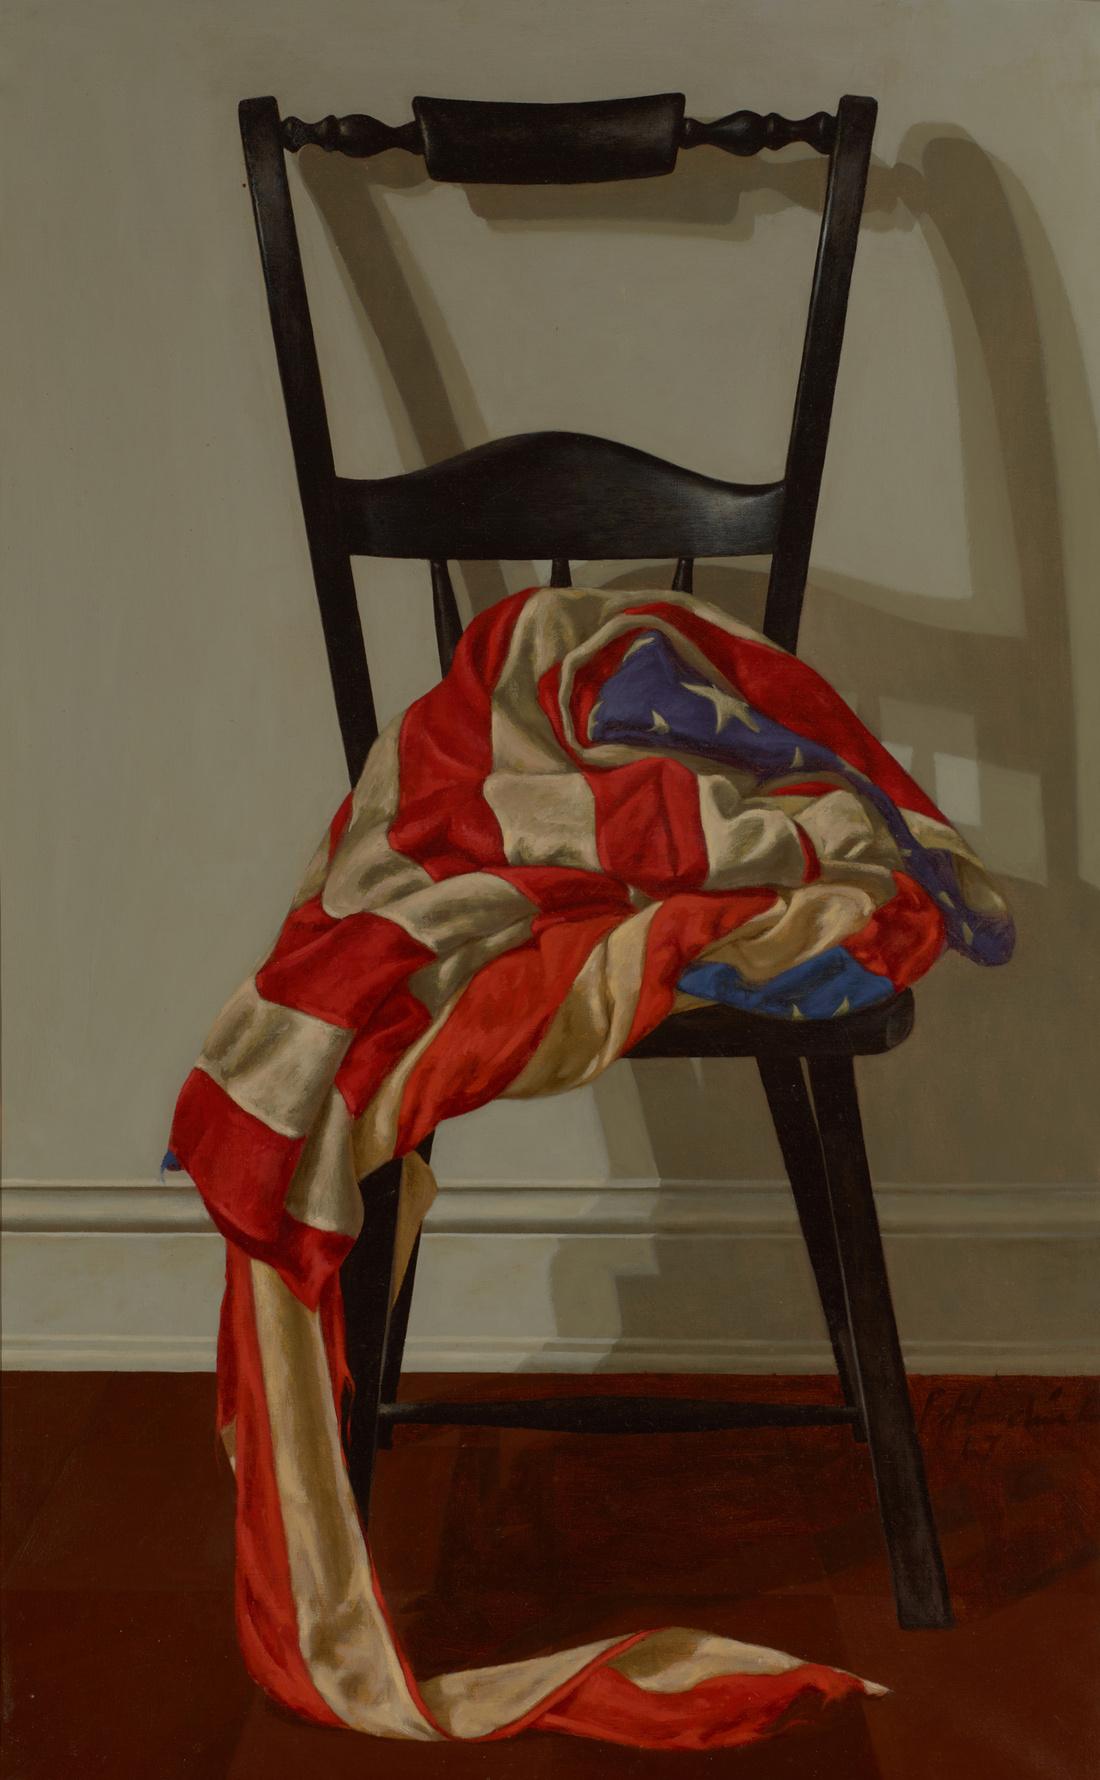 Barkley L. Hendricks, Star Spangled Chitlins, 1967. Courtesy of Bowdoin College Museum of Art.